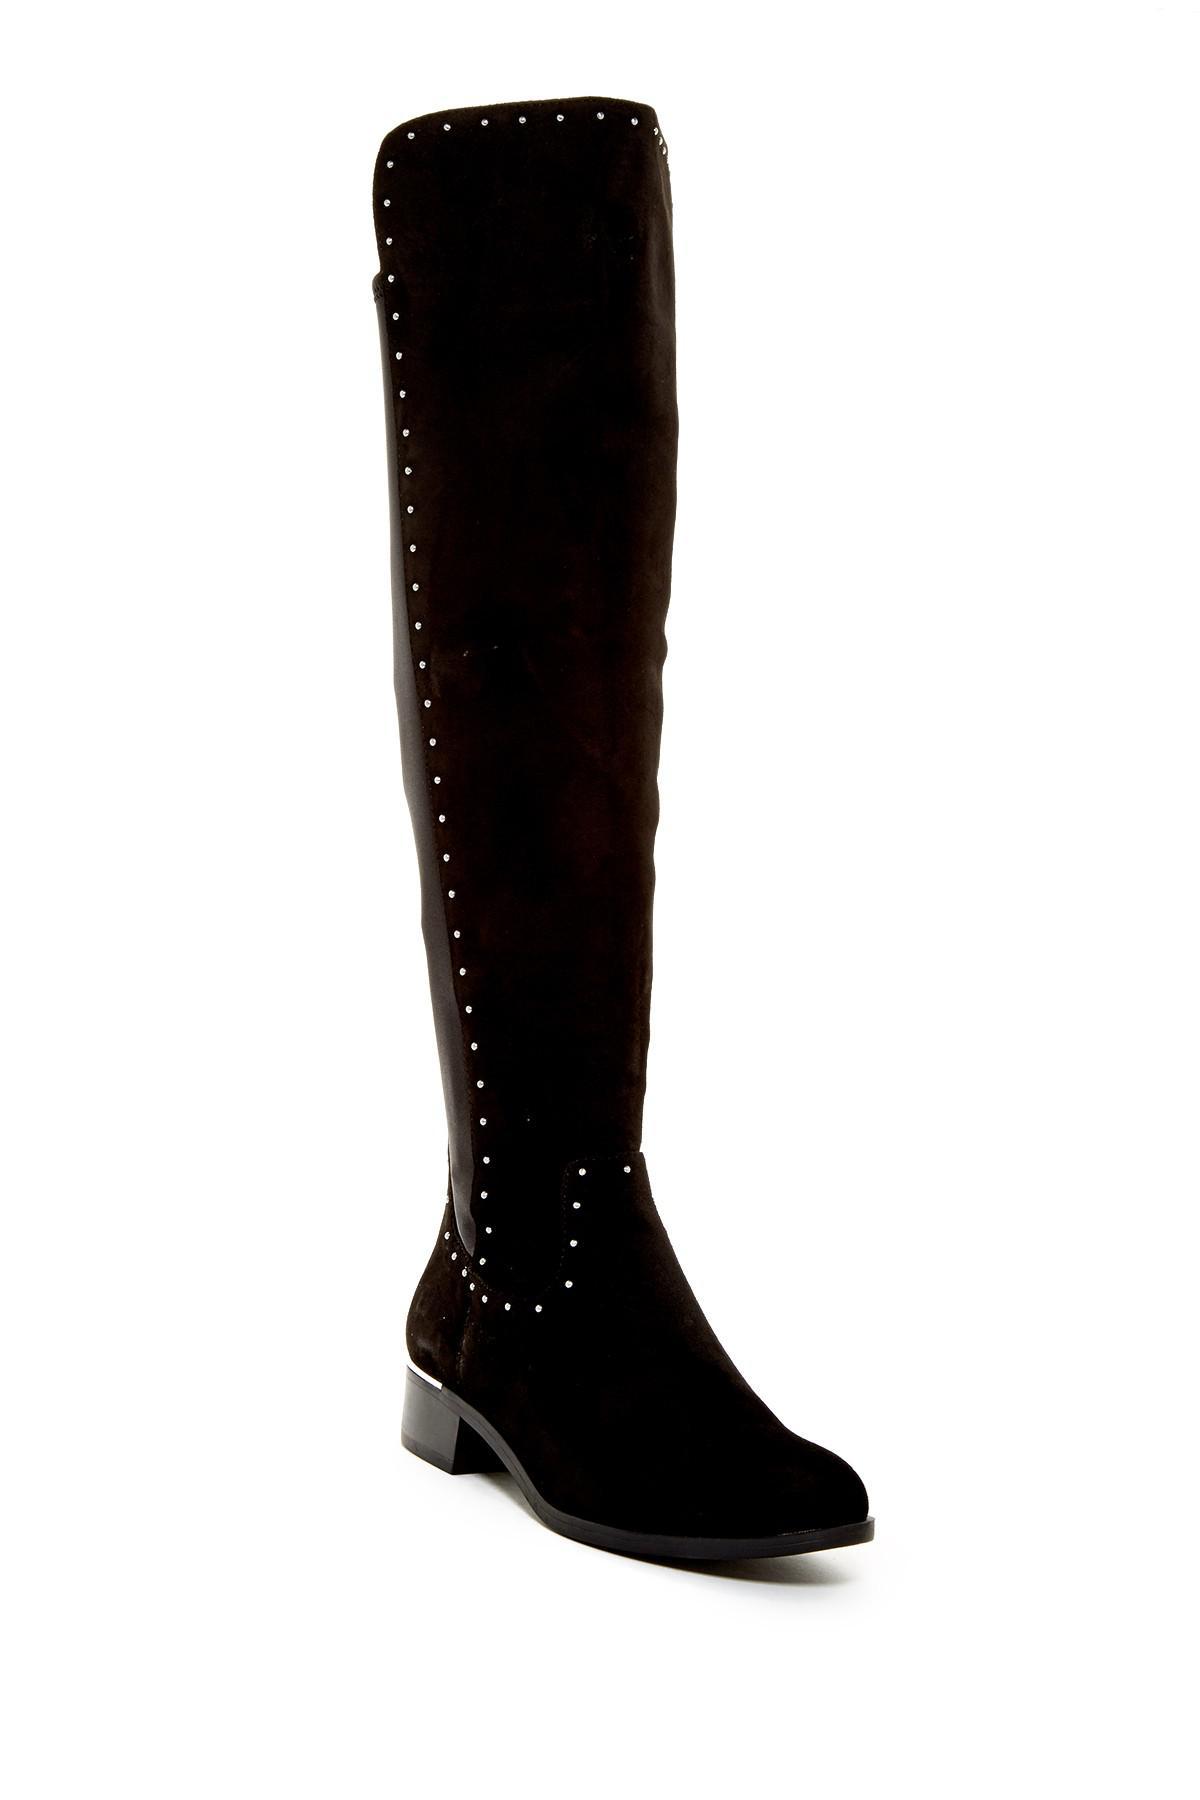 Calvin Klein Women's Cynthia Studded Riding Boot Kw7L1an